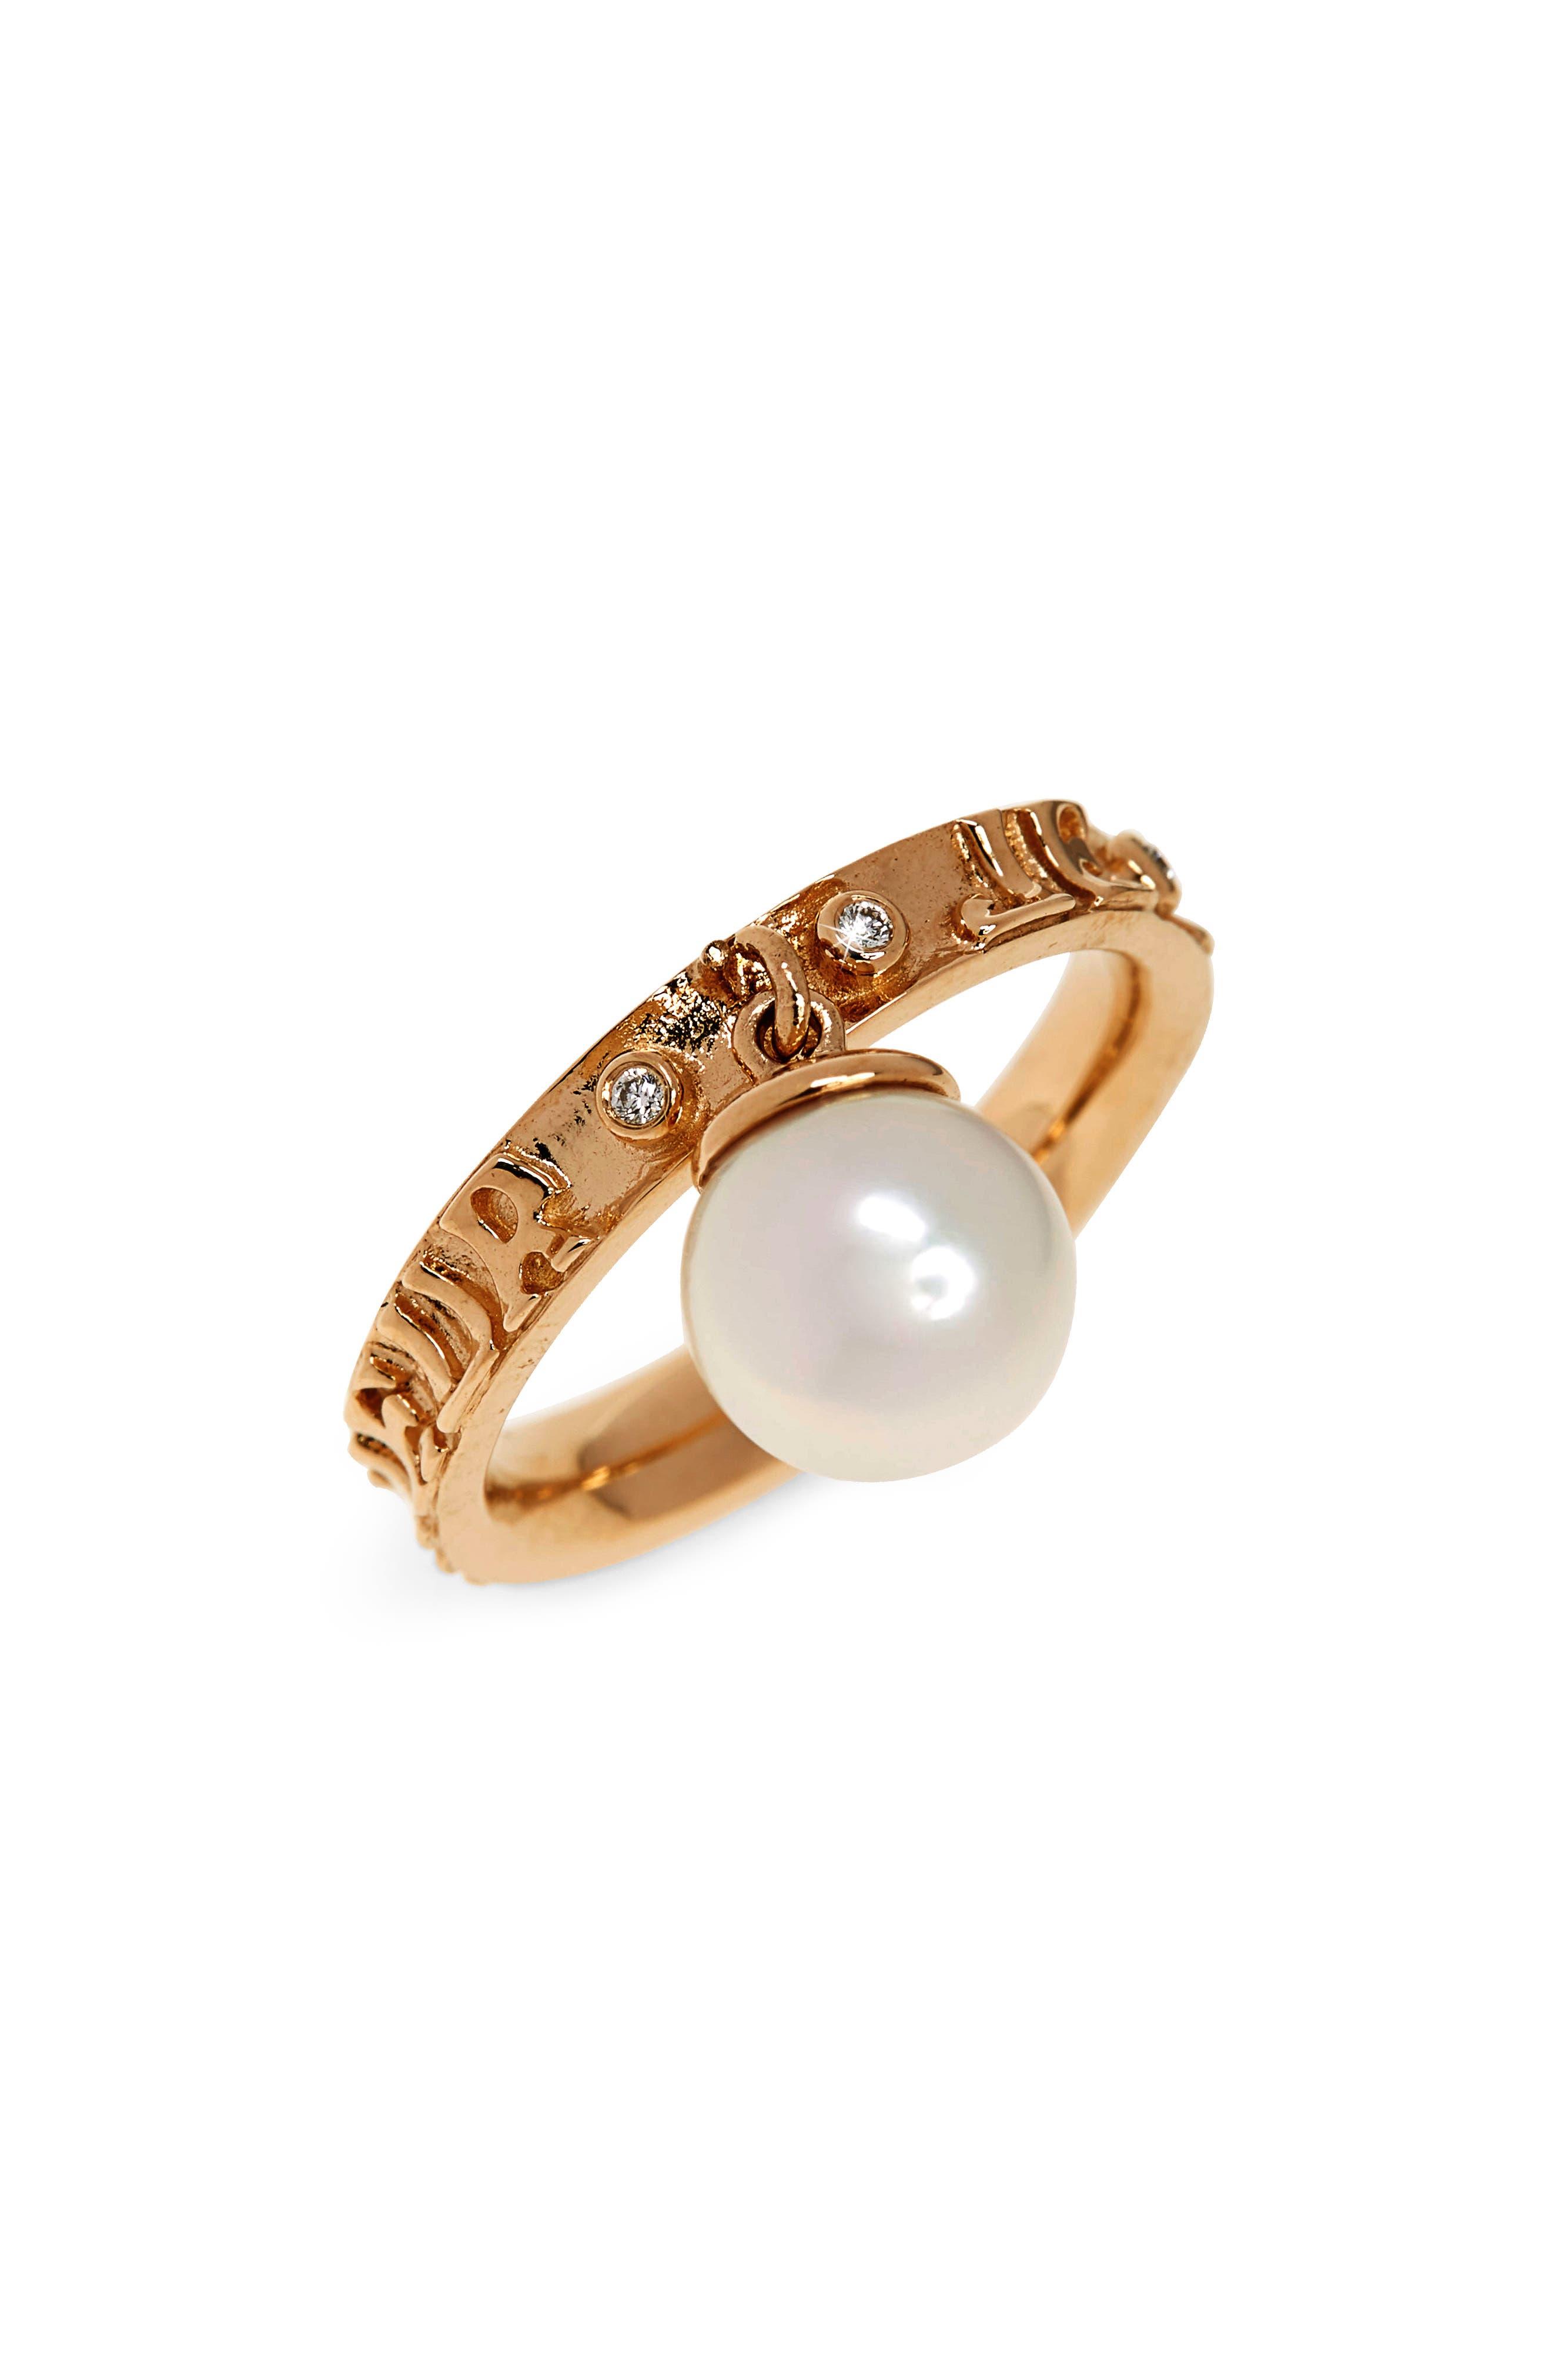 Dancing Pearl Ring,                         Main,                         color, YELLOW GOLD